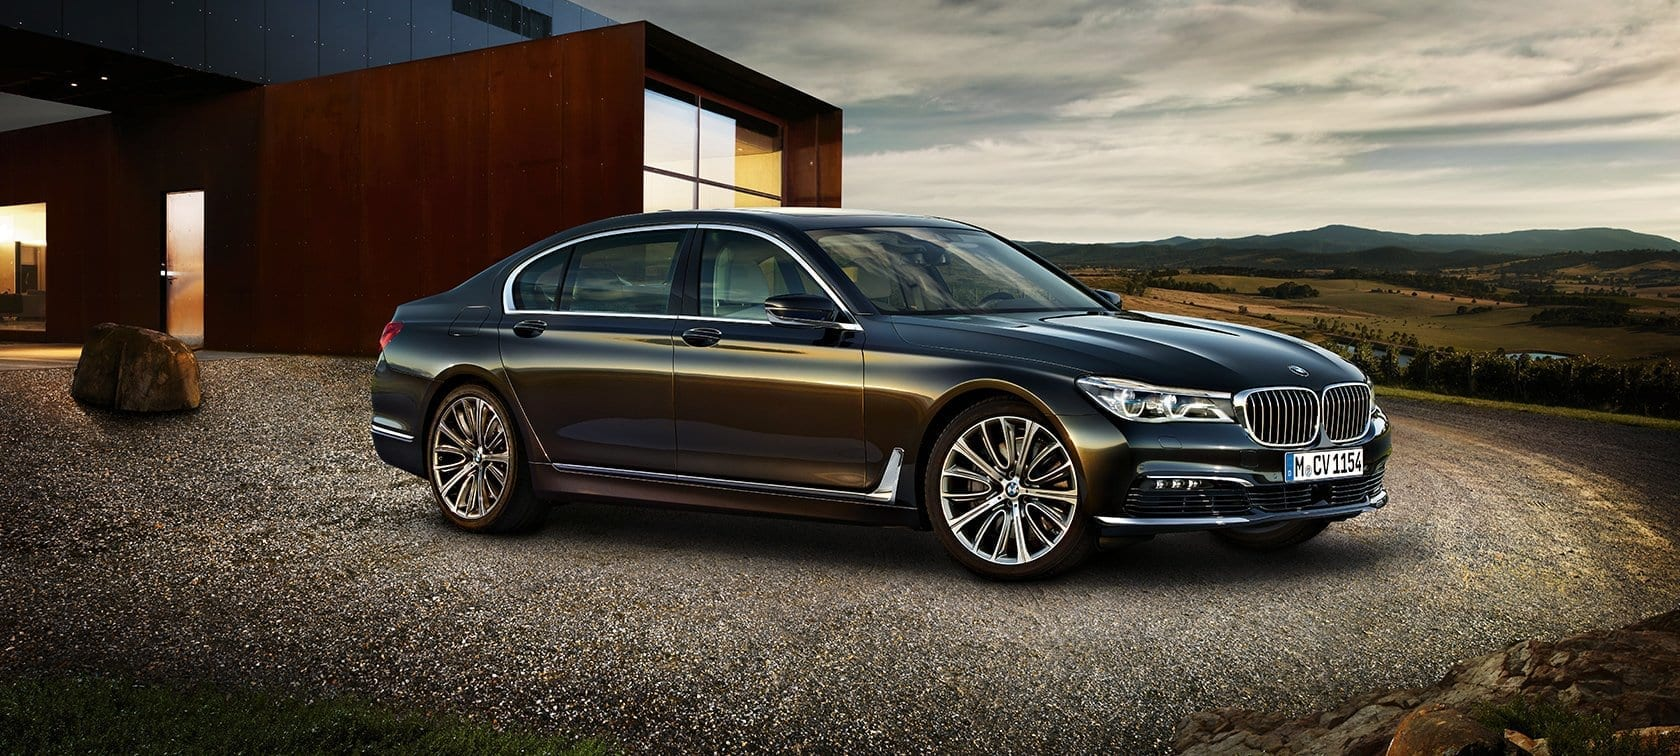 BMW 7 Series Sales Reports